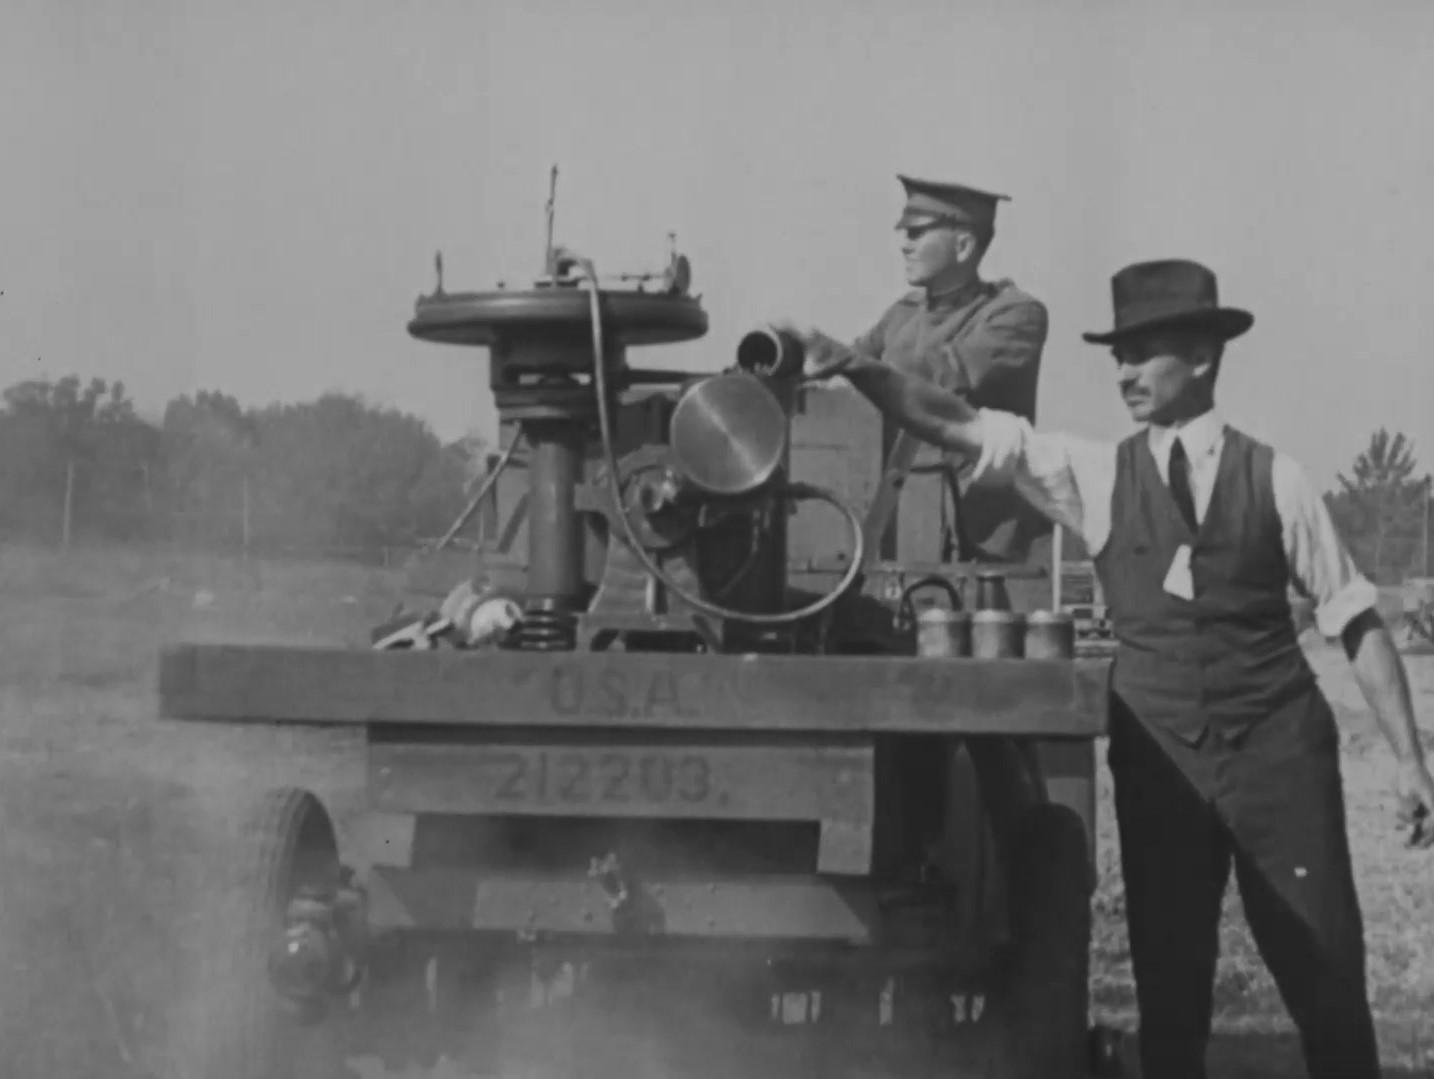 Centrifugal Machine Gun   111-h-1246-r1_HD_2Mbps_Trim_Moment - Copy.jpg